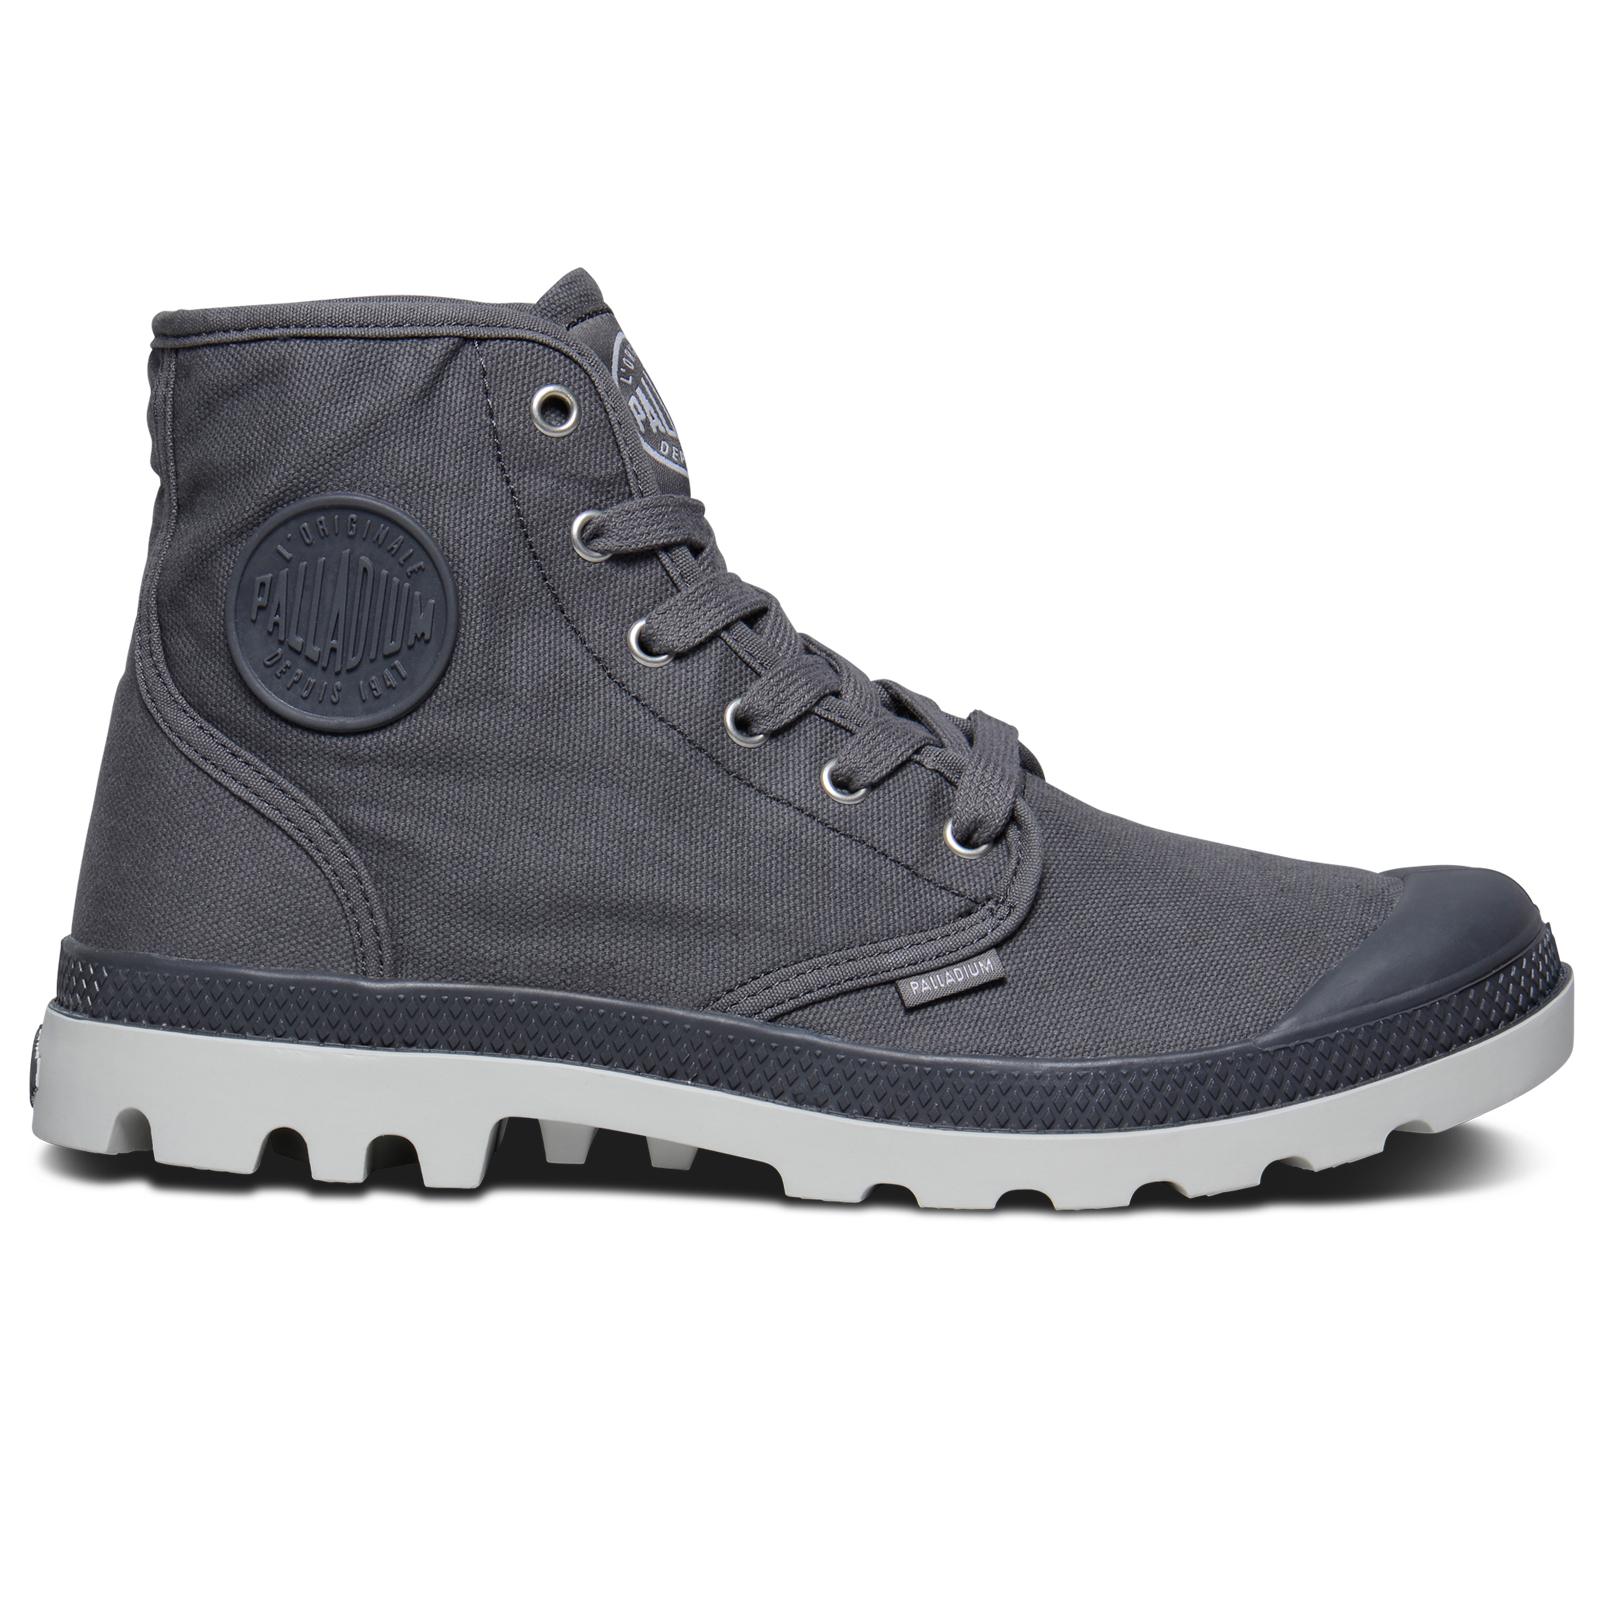 palladium mens shoes pa hi canvas new walking high top